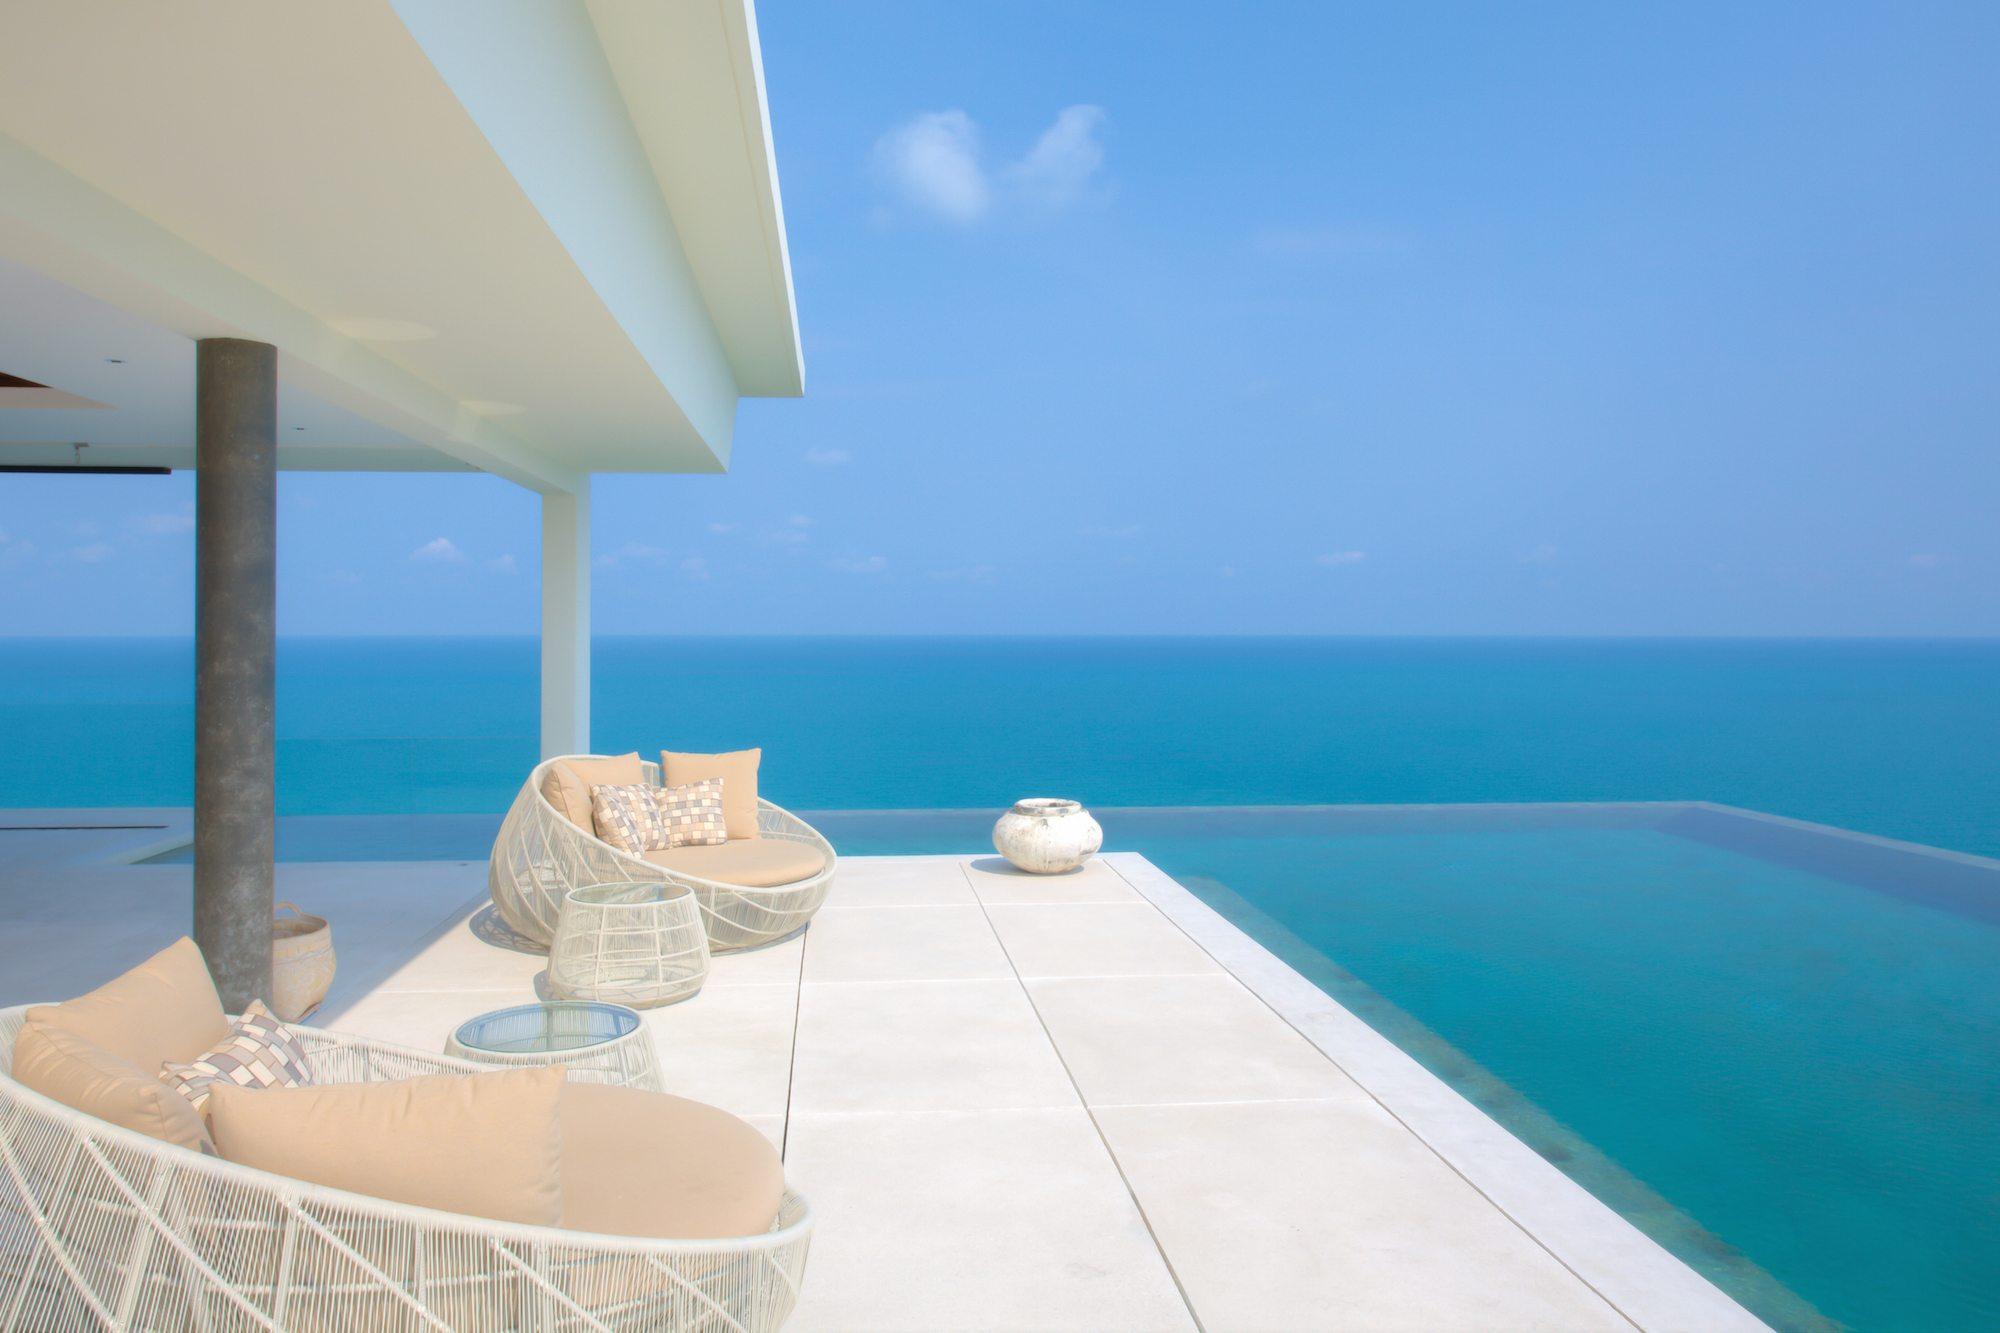 8 Villas With Amazing Views